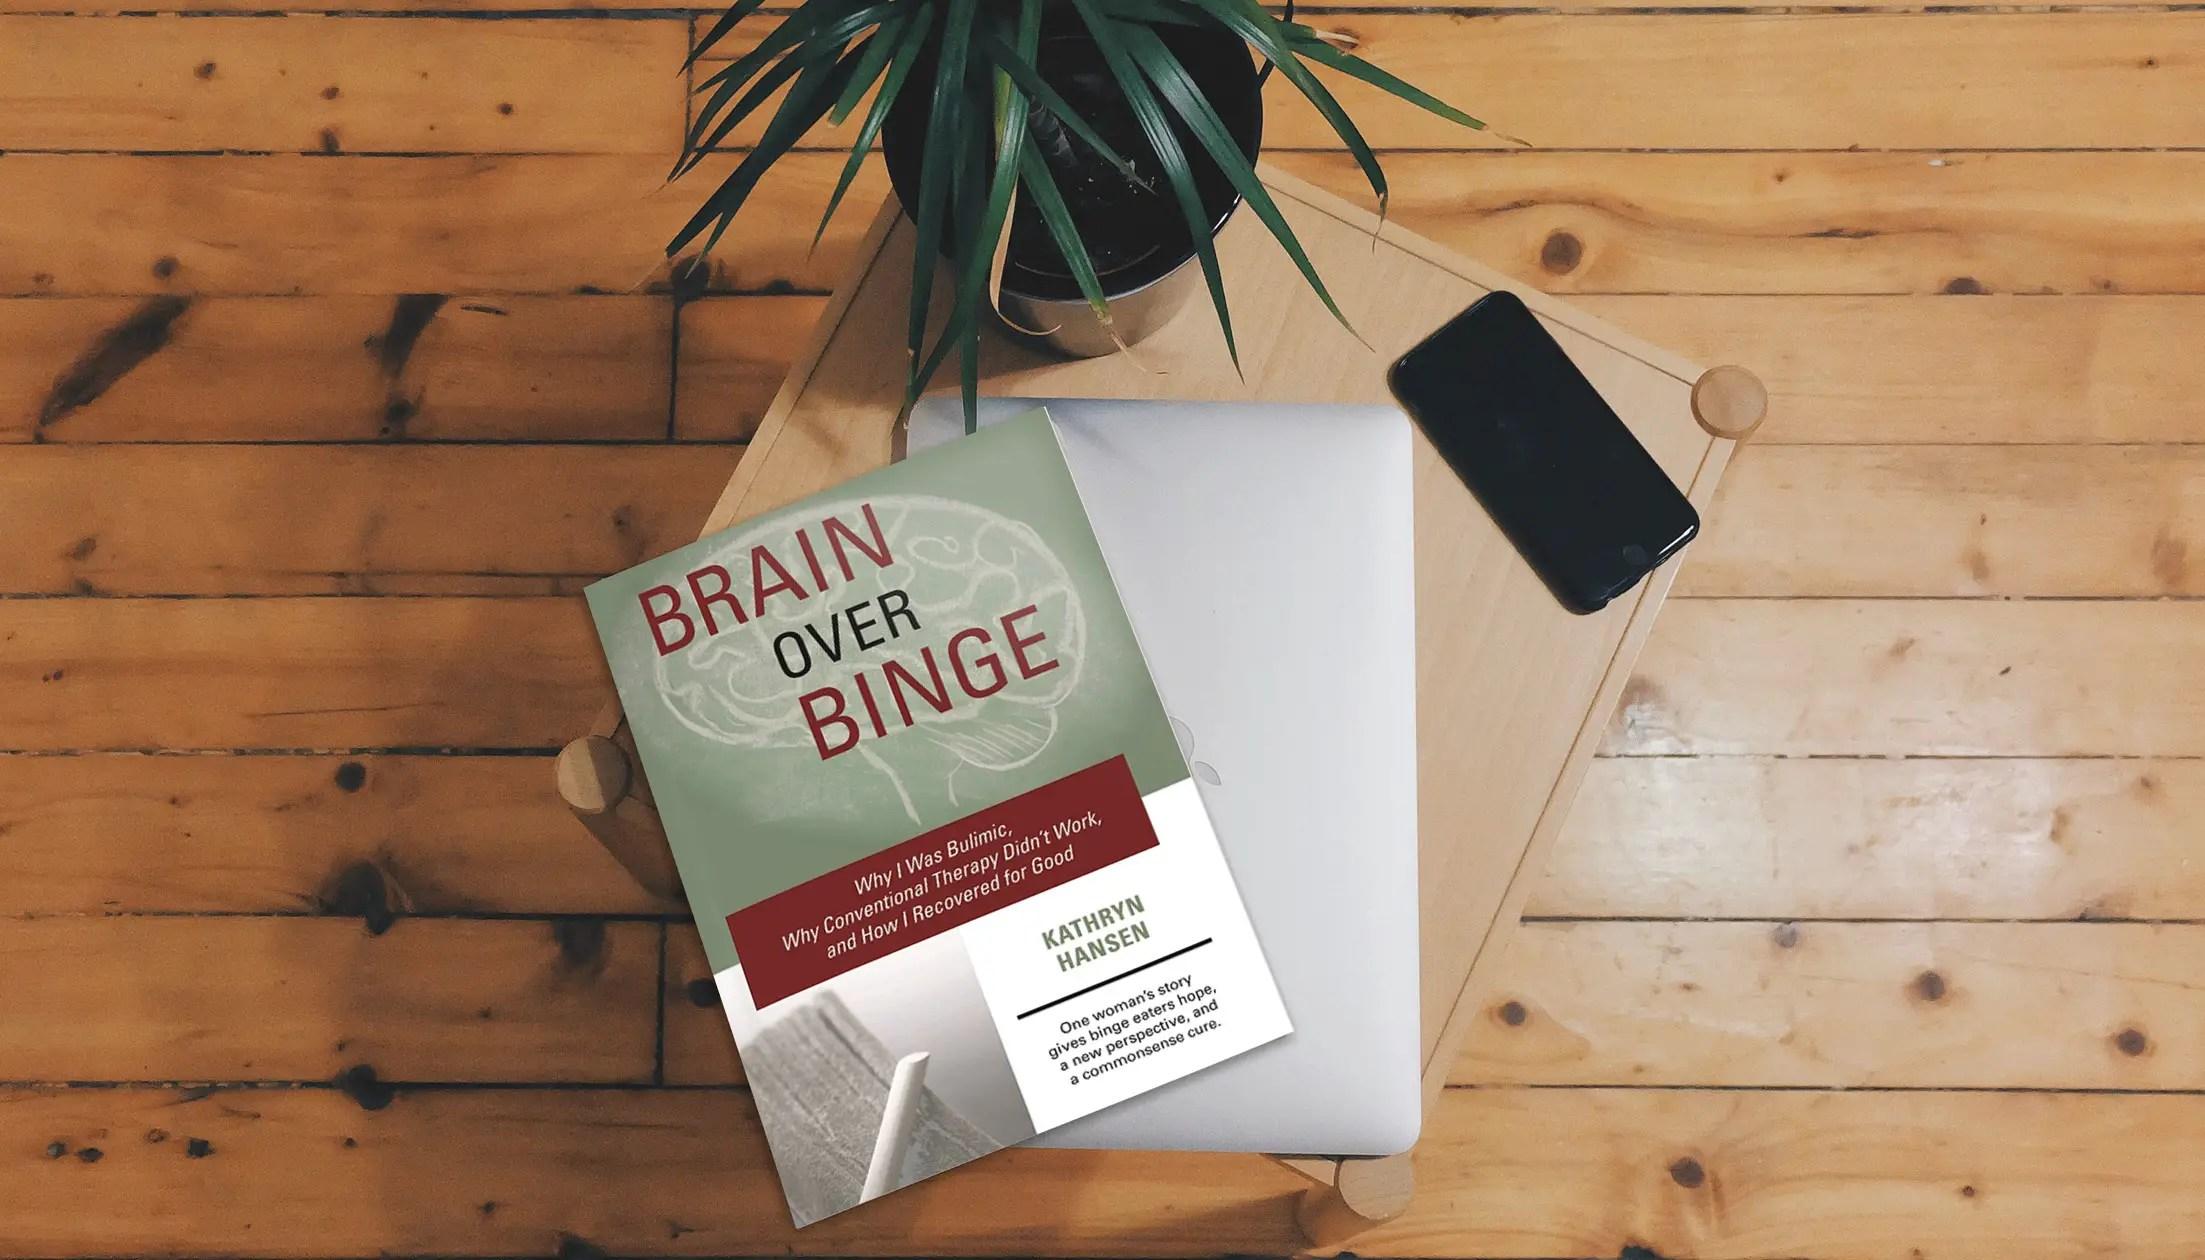 brain over binge, kathryn hansen, bulimia, bingeing, overeating